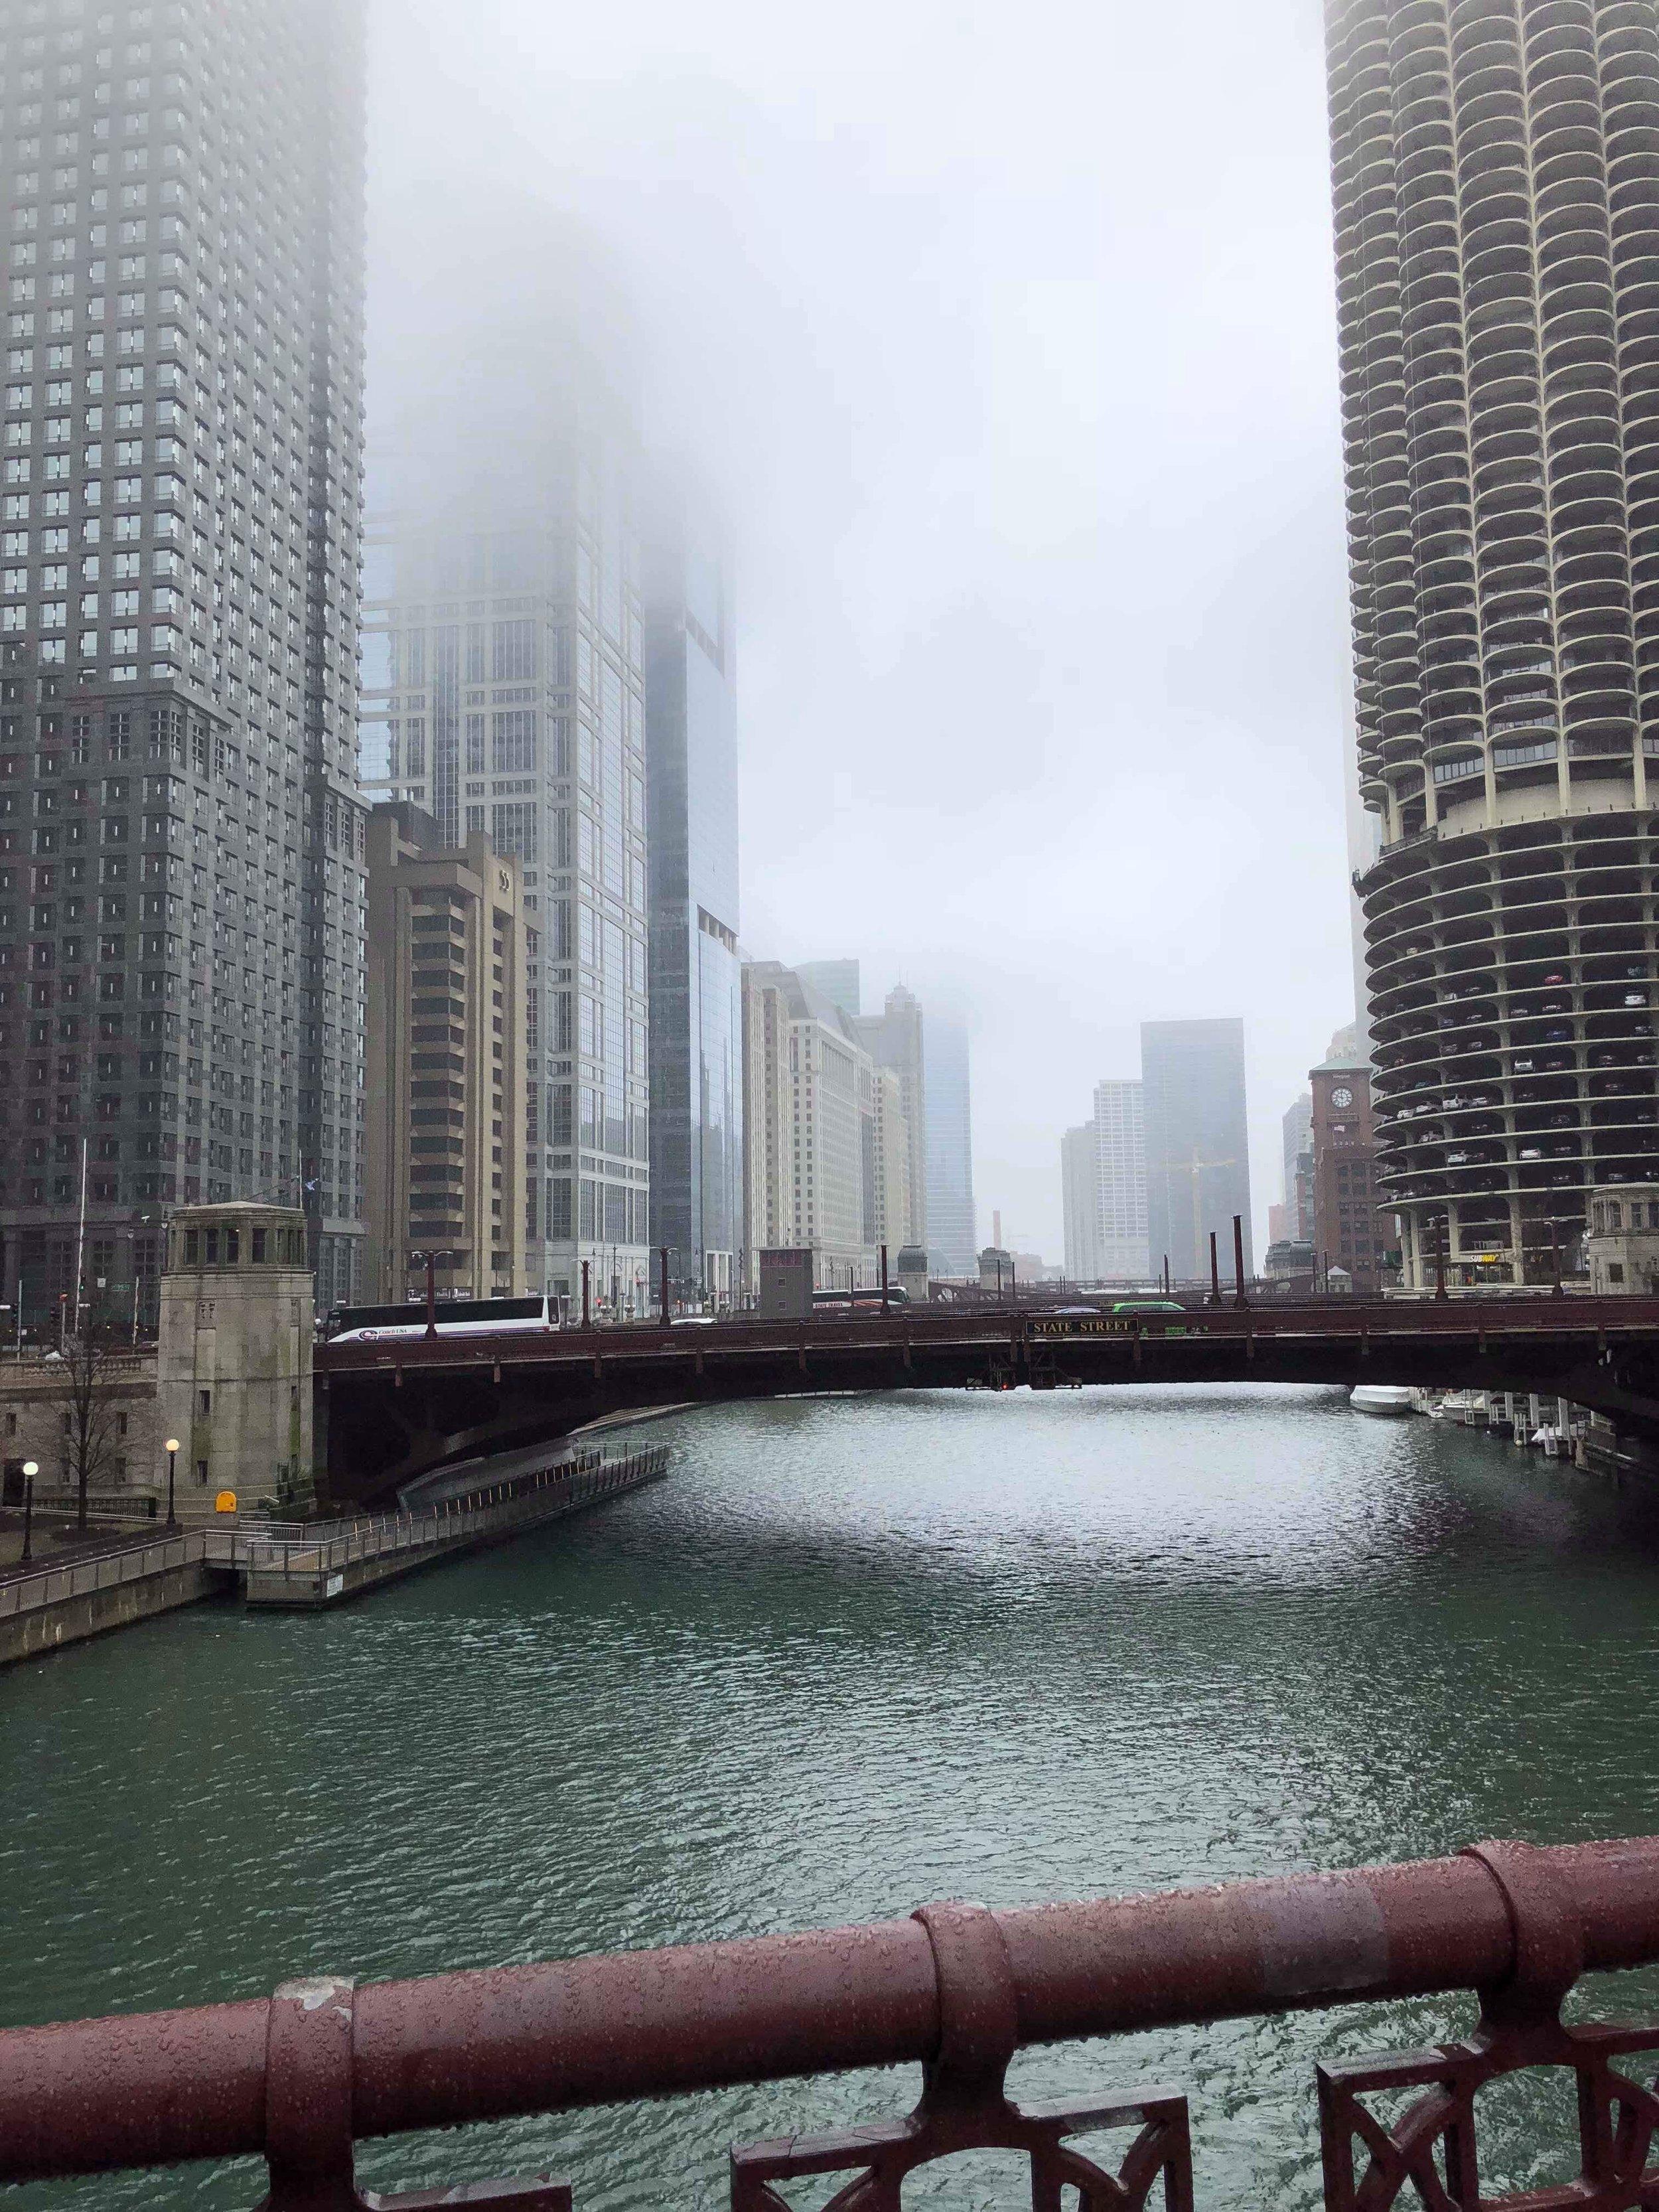 Rainy and foggy but beautiful!